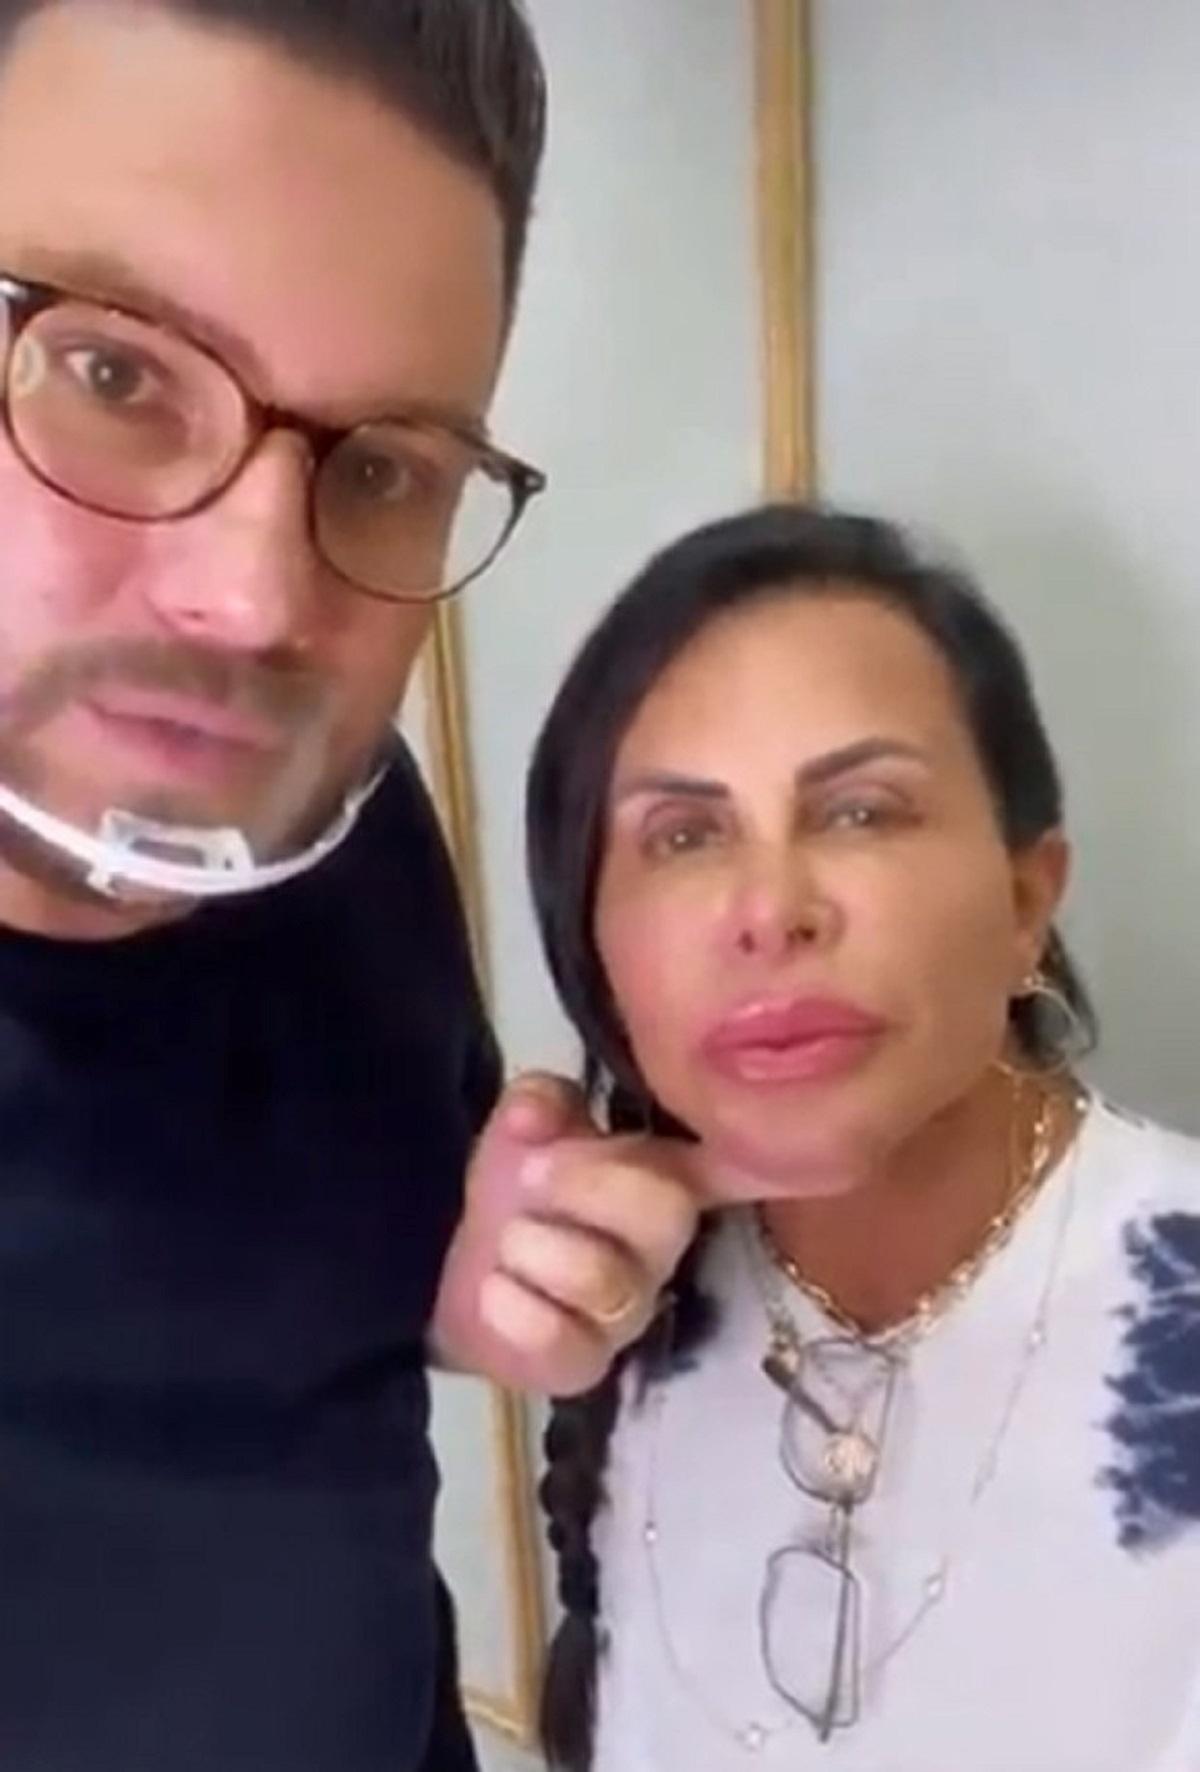 Gretchen mostra novos procedimentos estéticos que fez no rosto